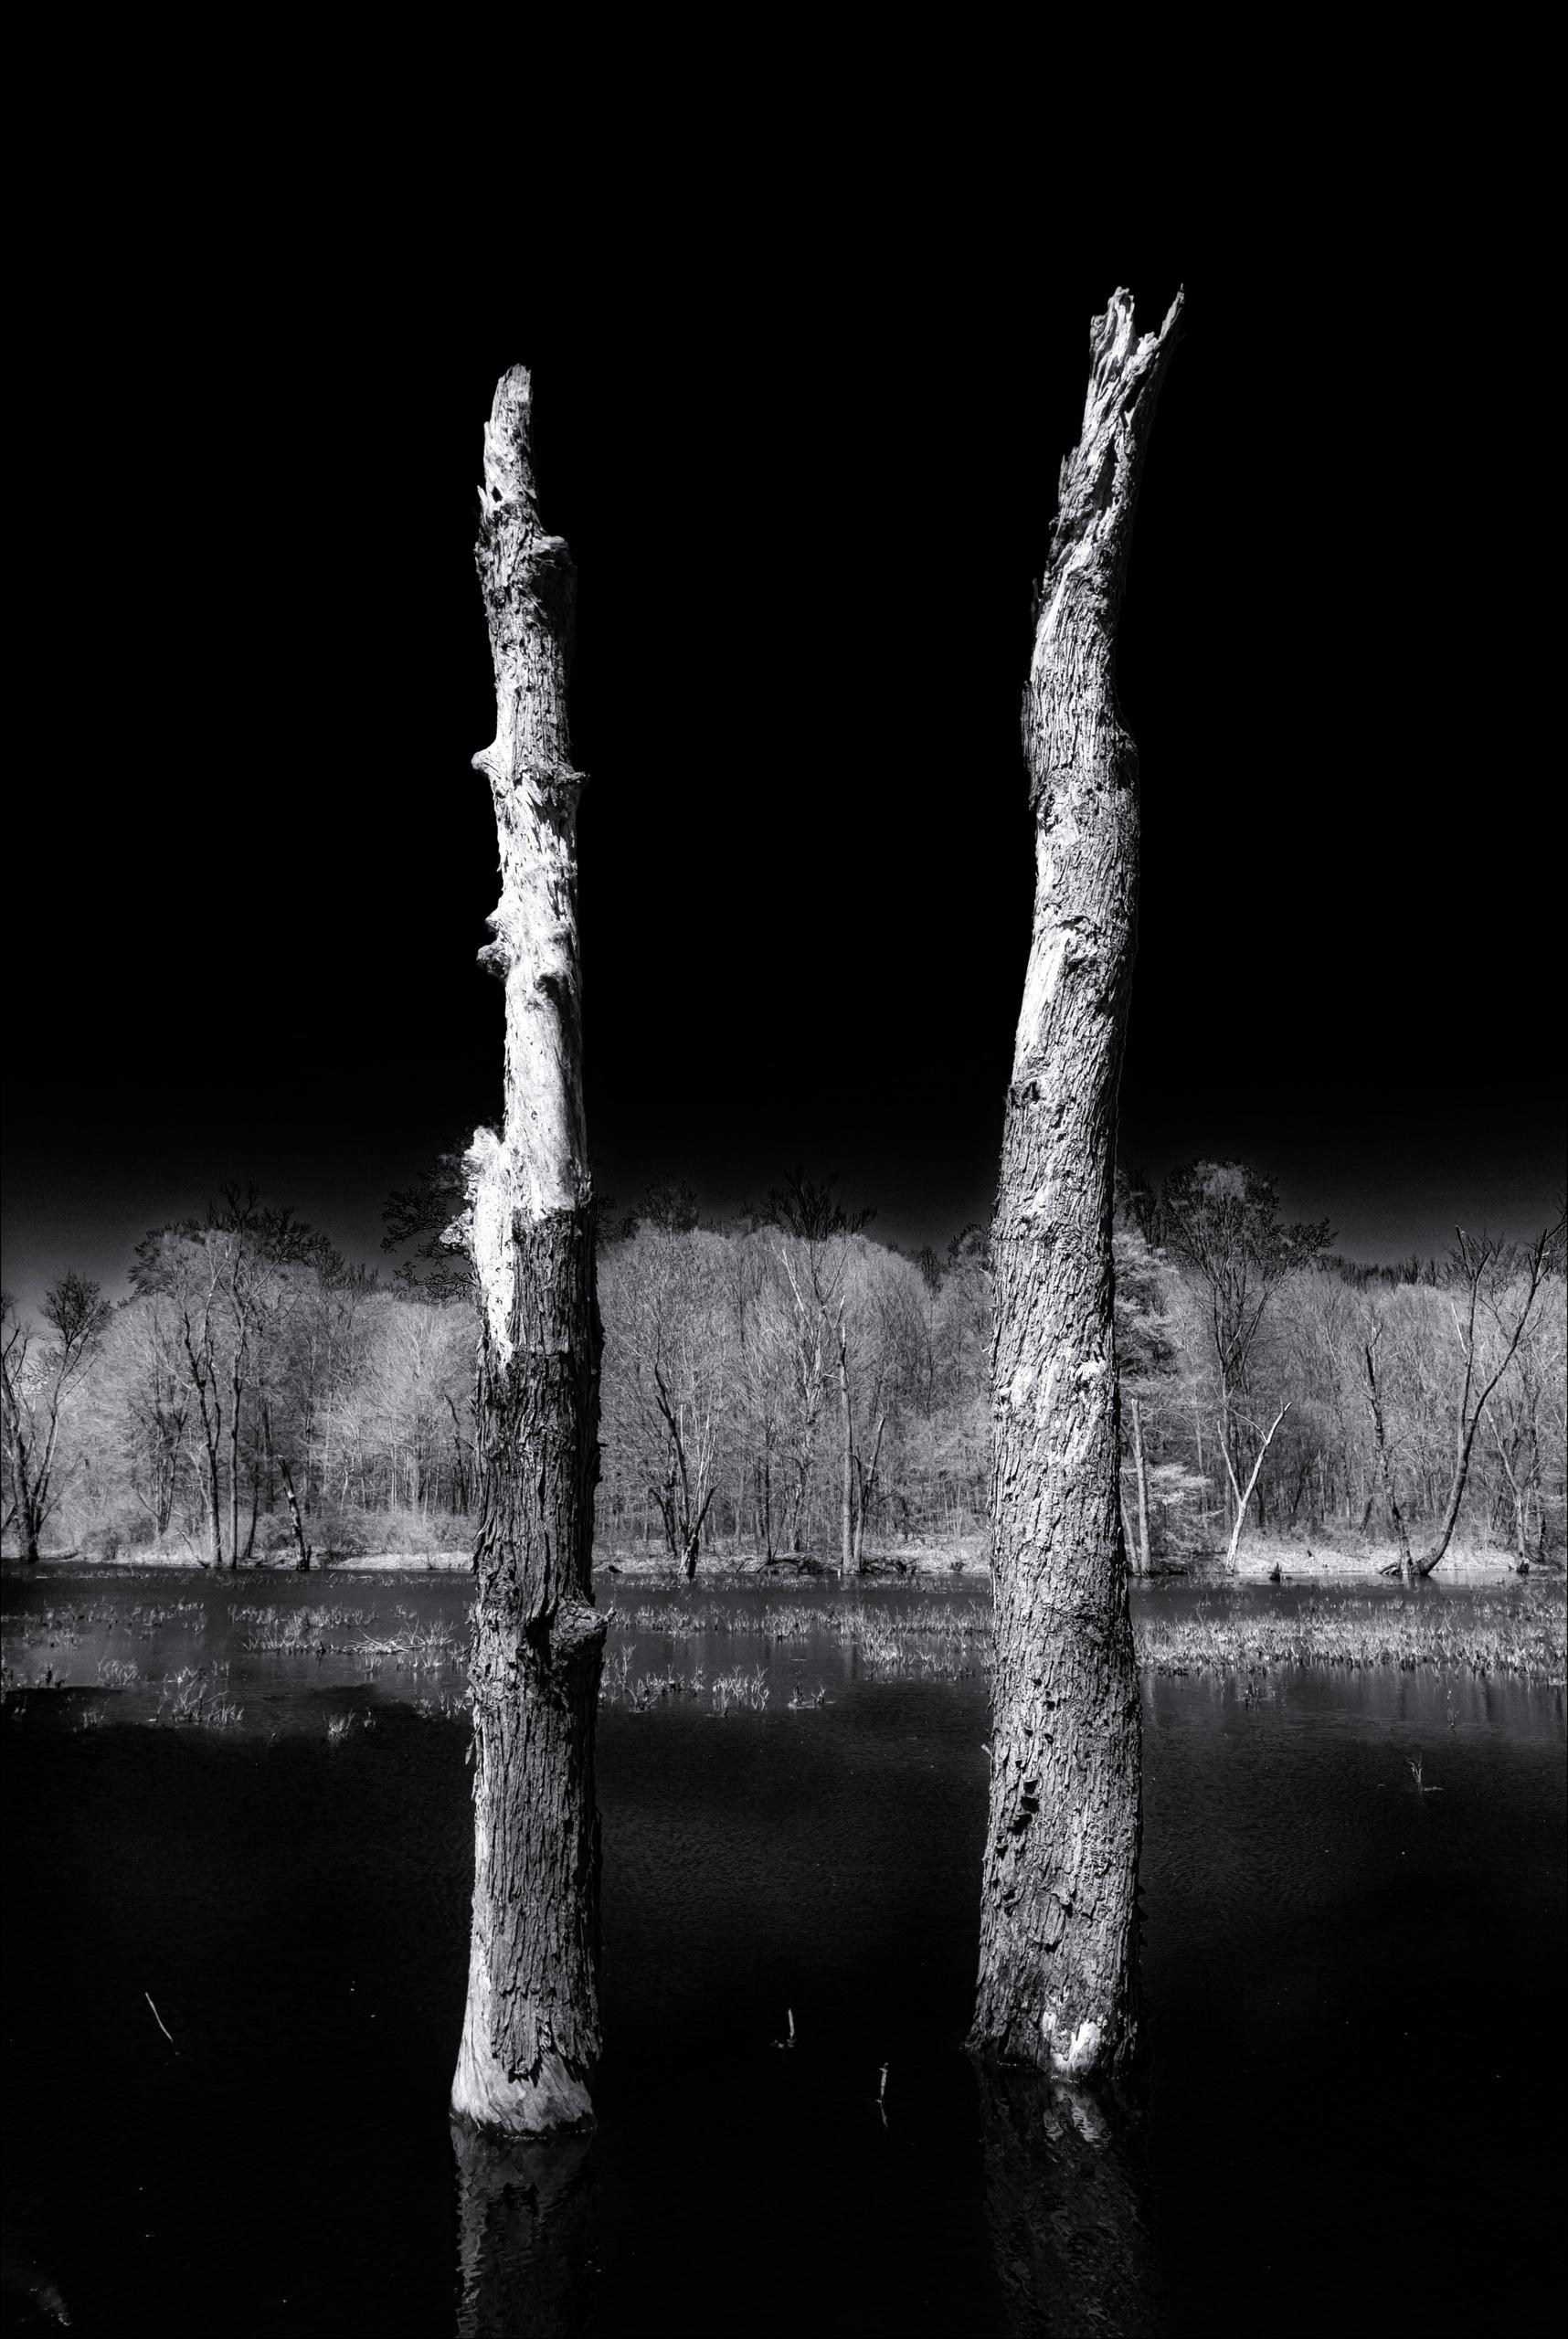 standing  - monochrome, blackandwhite - docdenny | ello